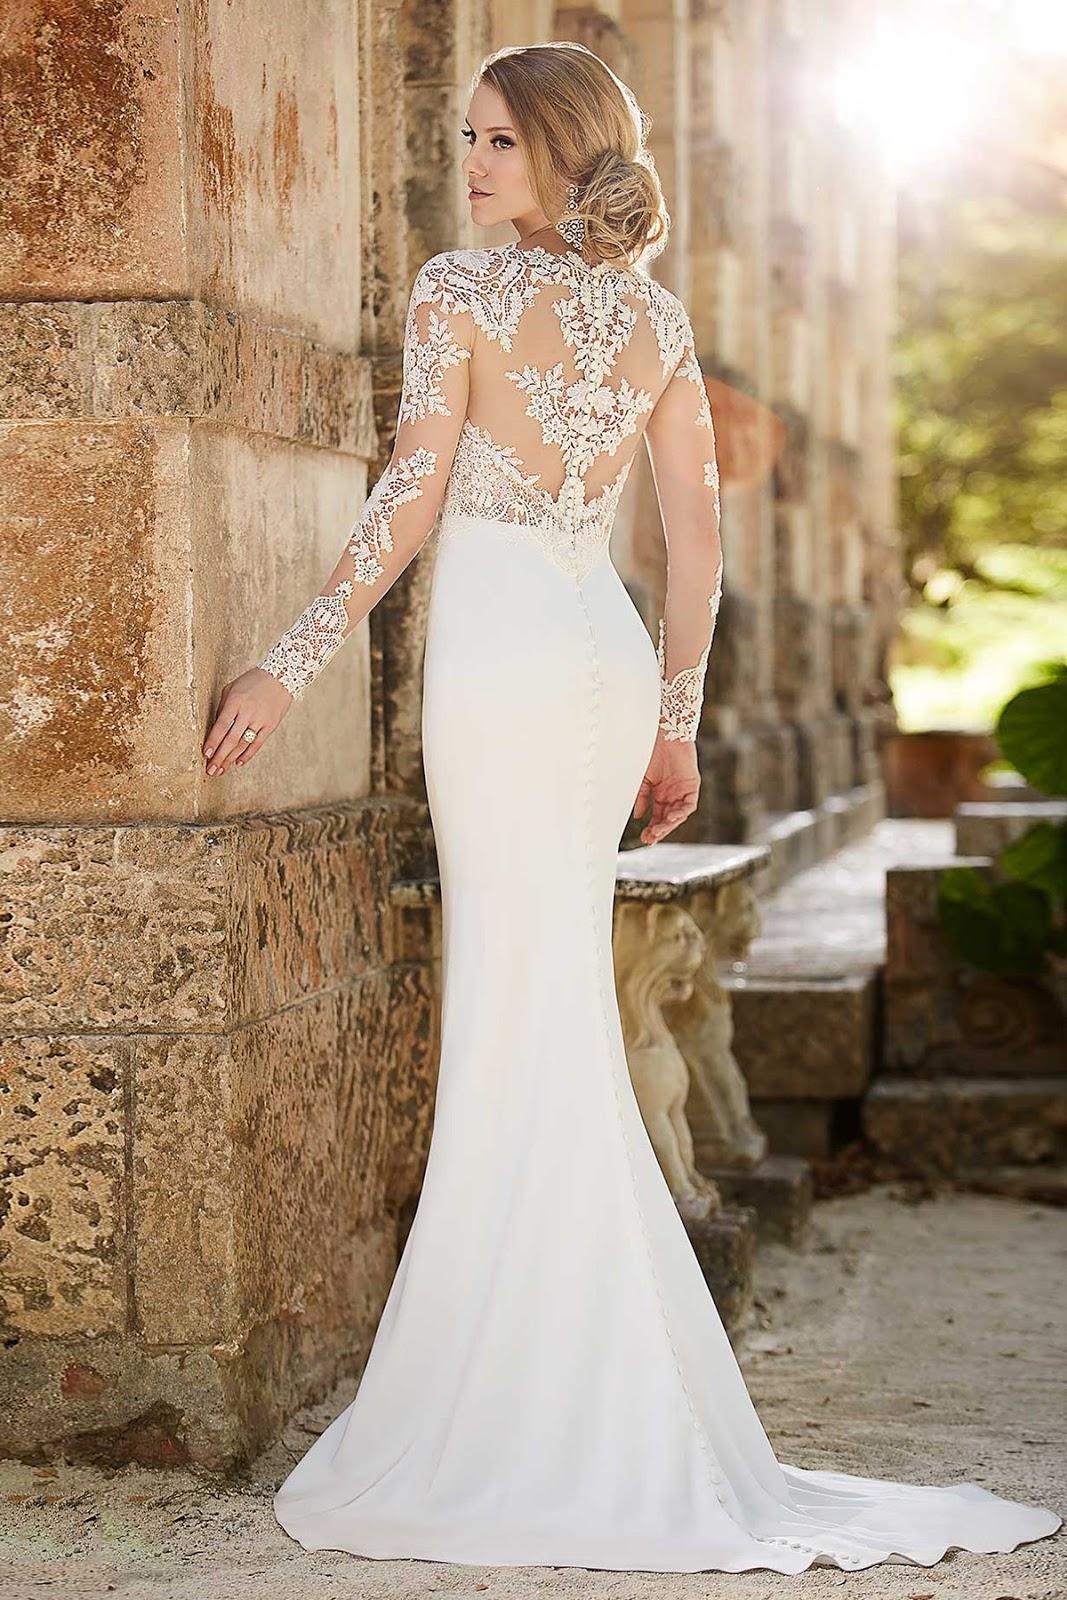 LANDYBRIDAL WEDDING DRESSES MISSY MAYS WORLD